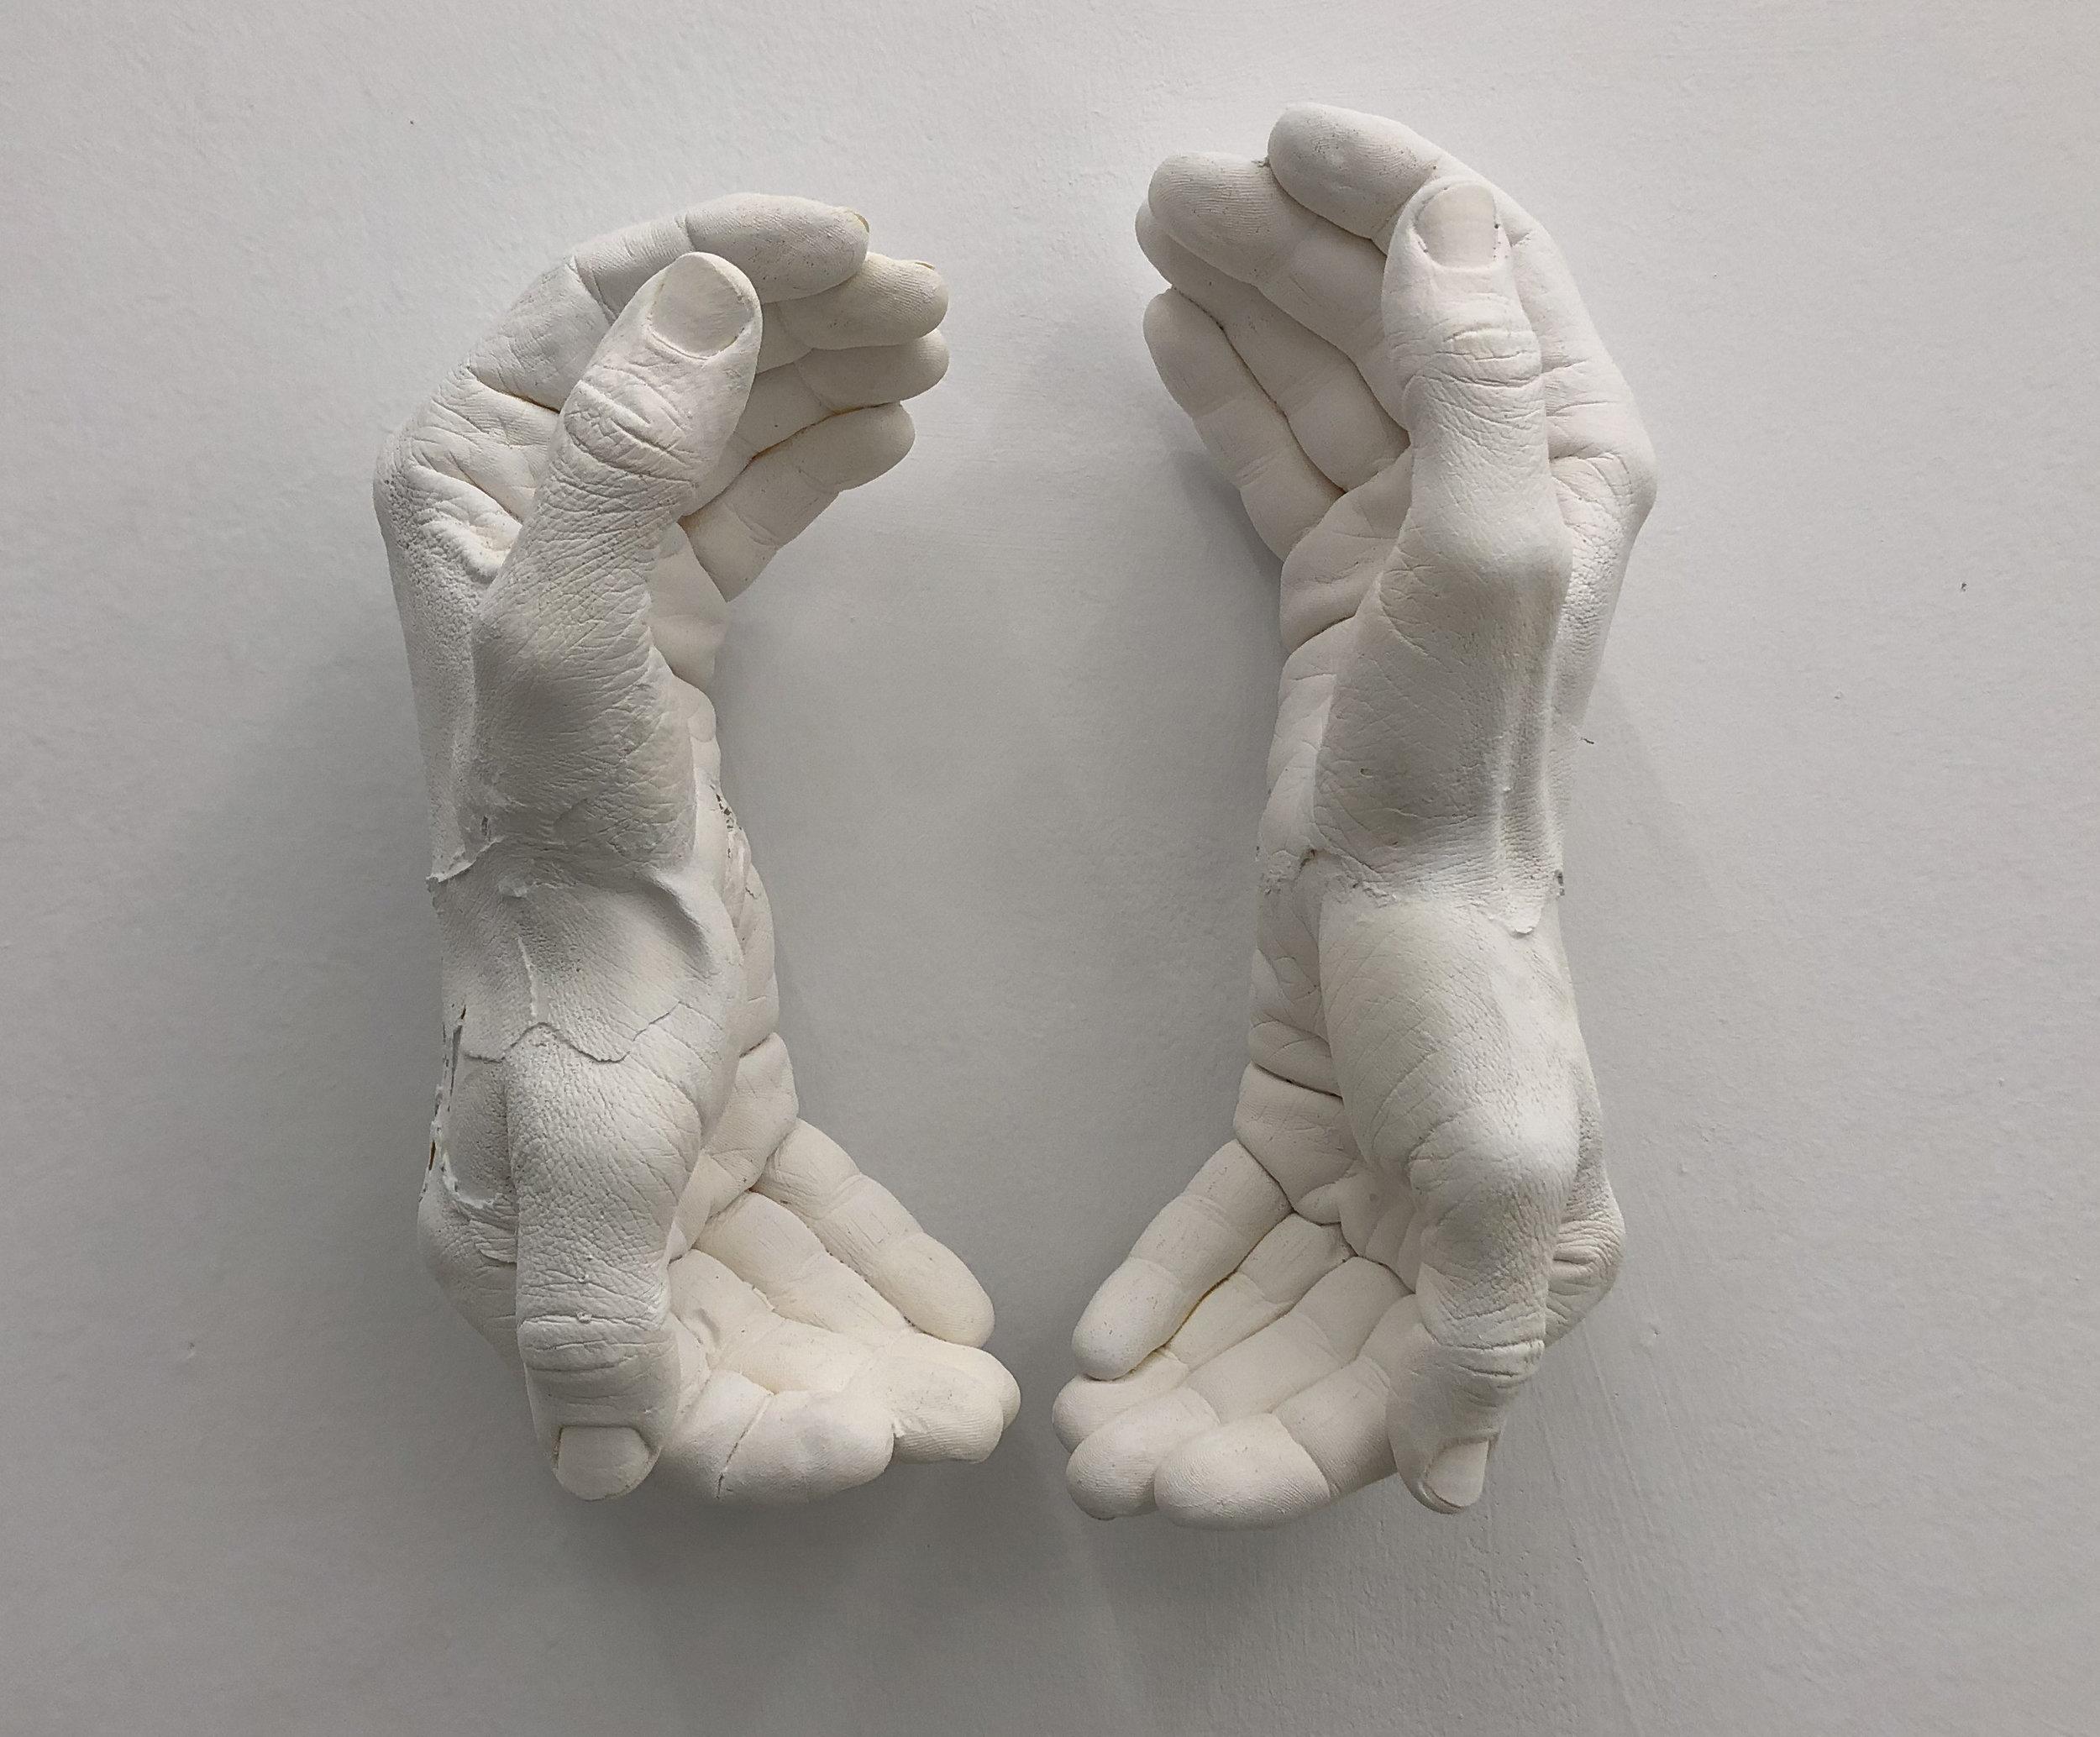 Amparo Sard, 4 Hands, 2019, Series: Precarious reactions